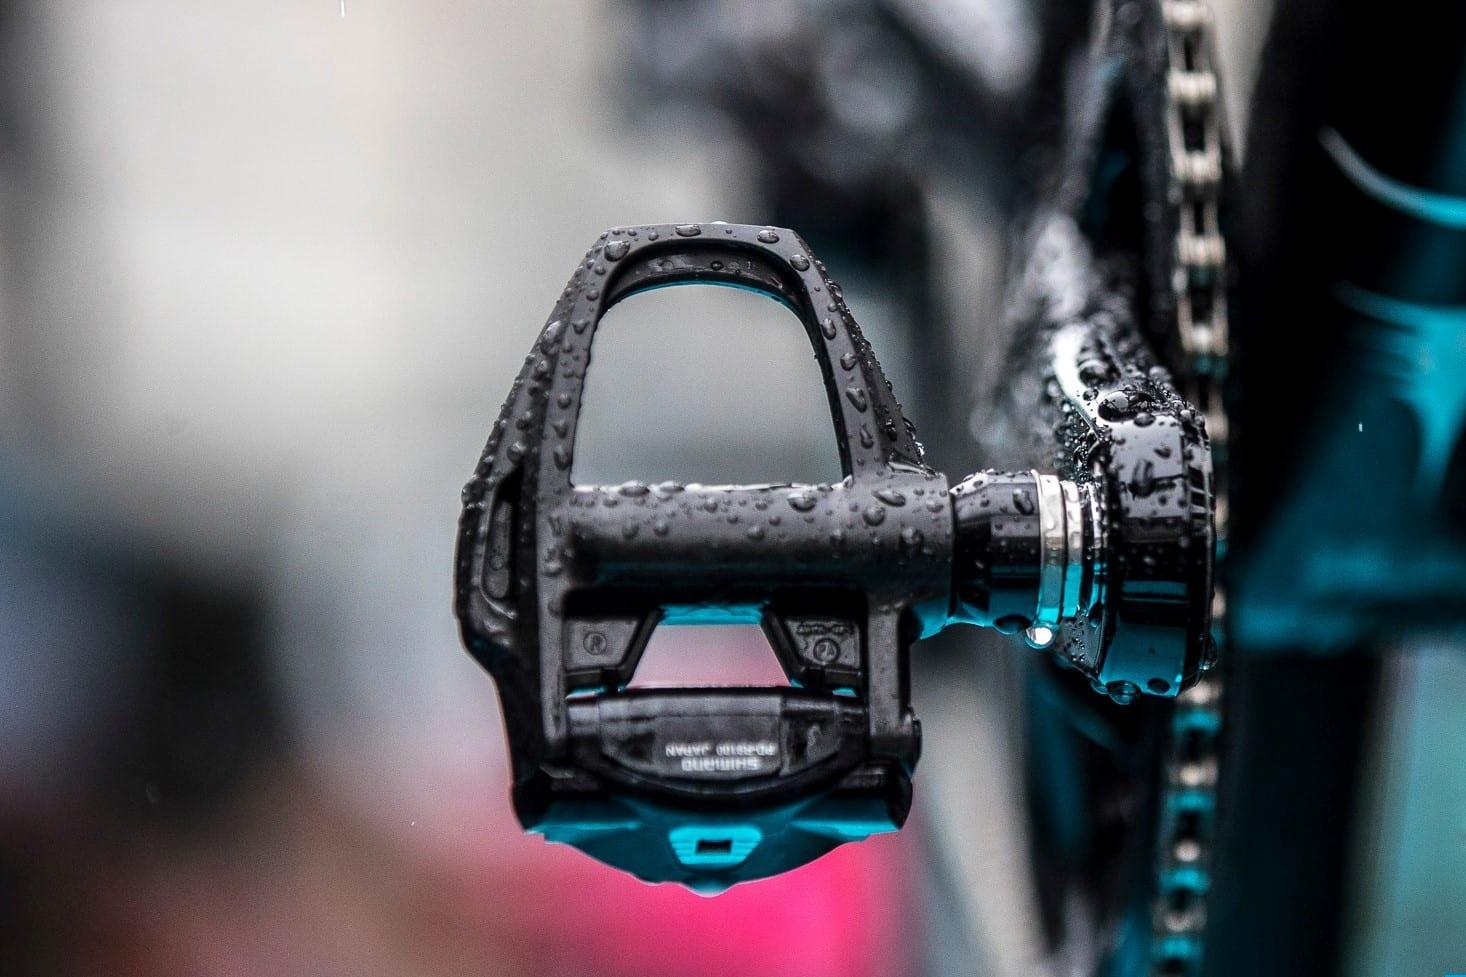 a Shimano road bike pedal